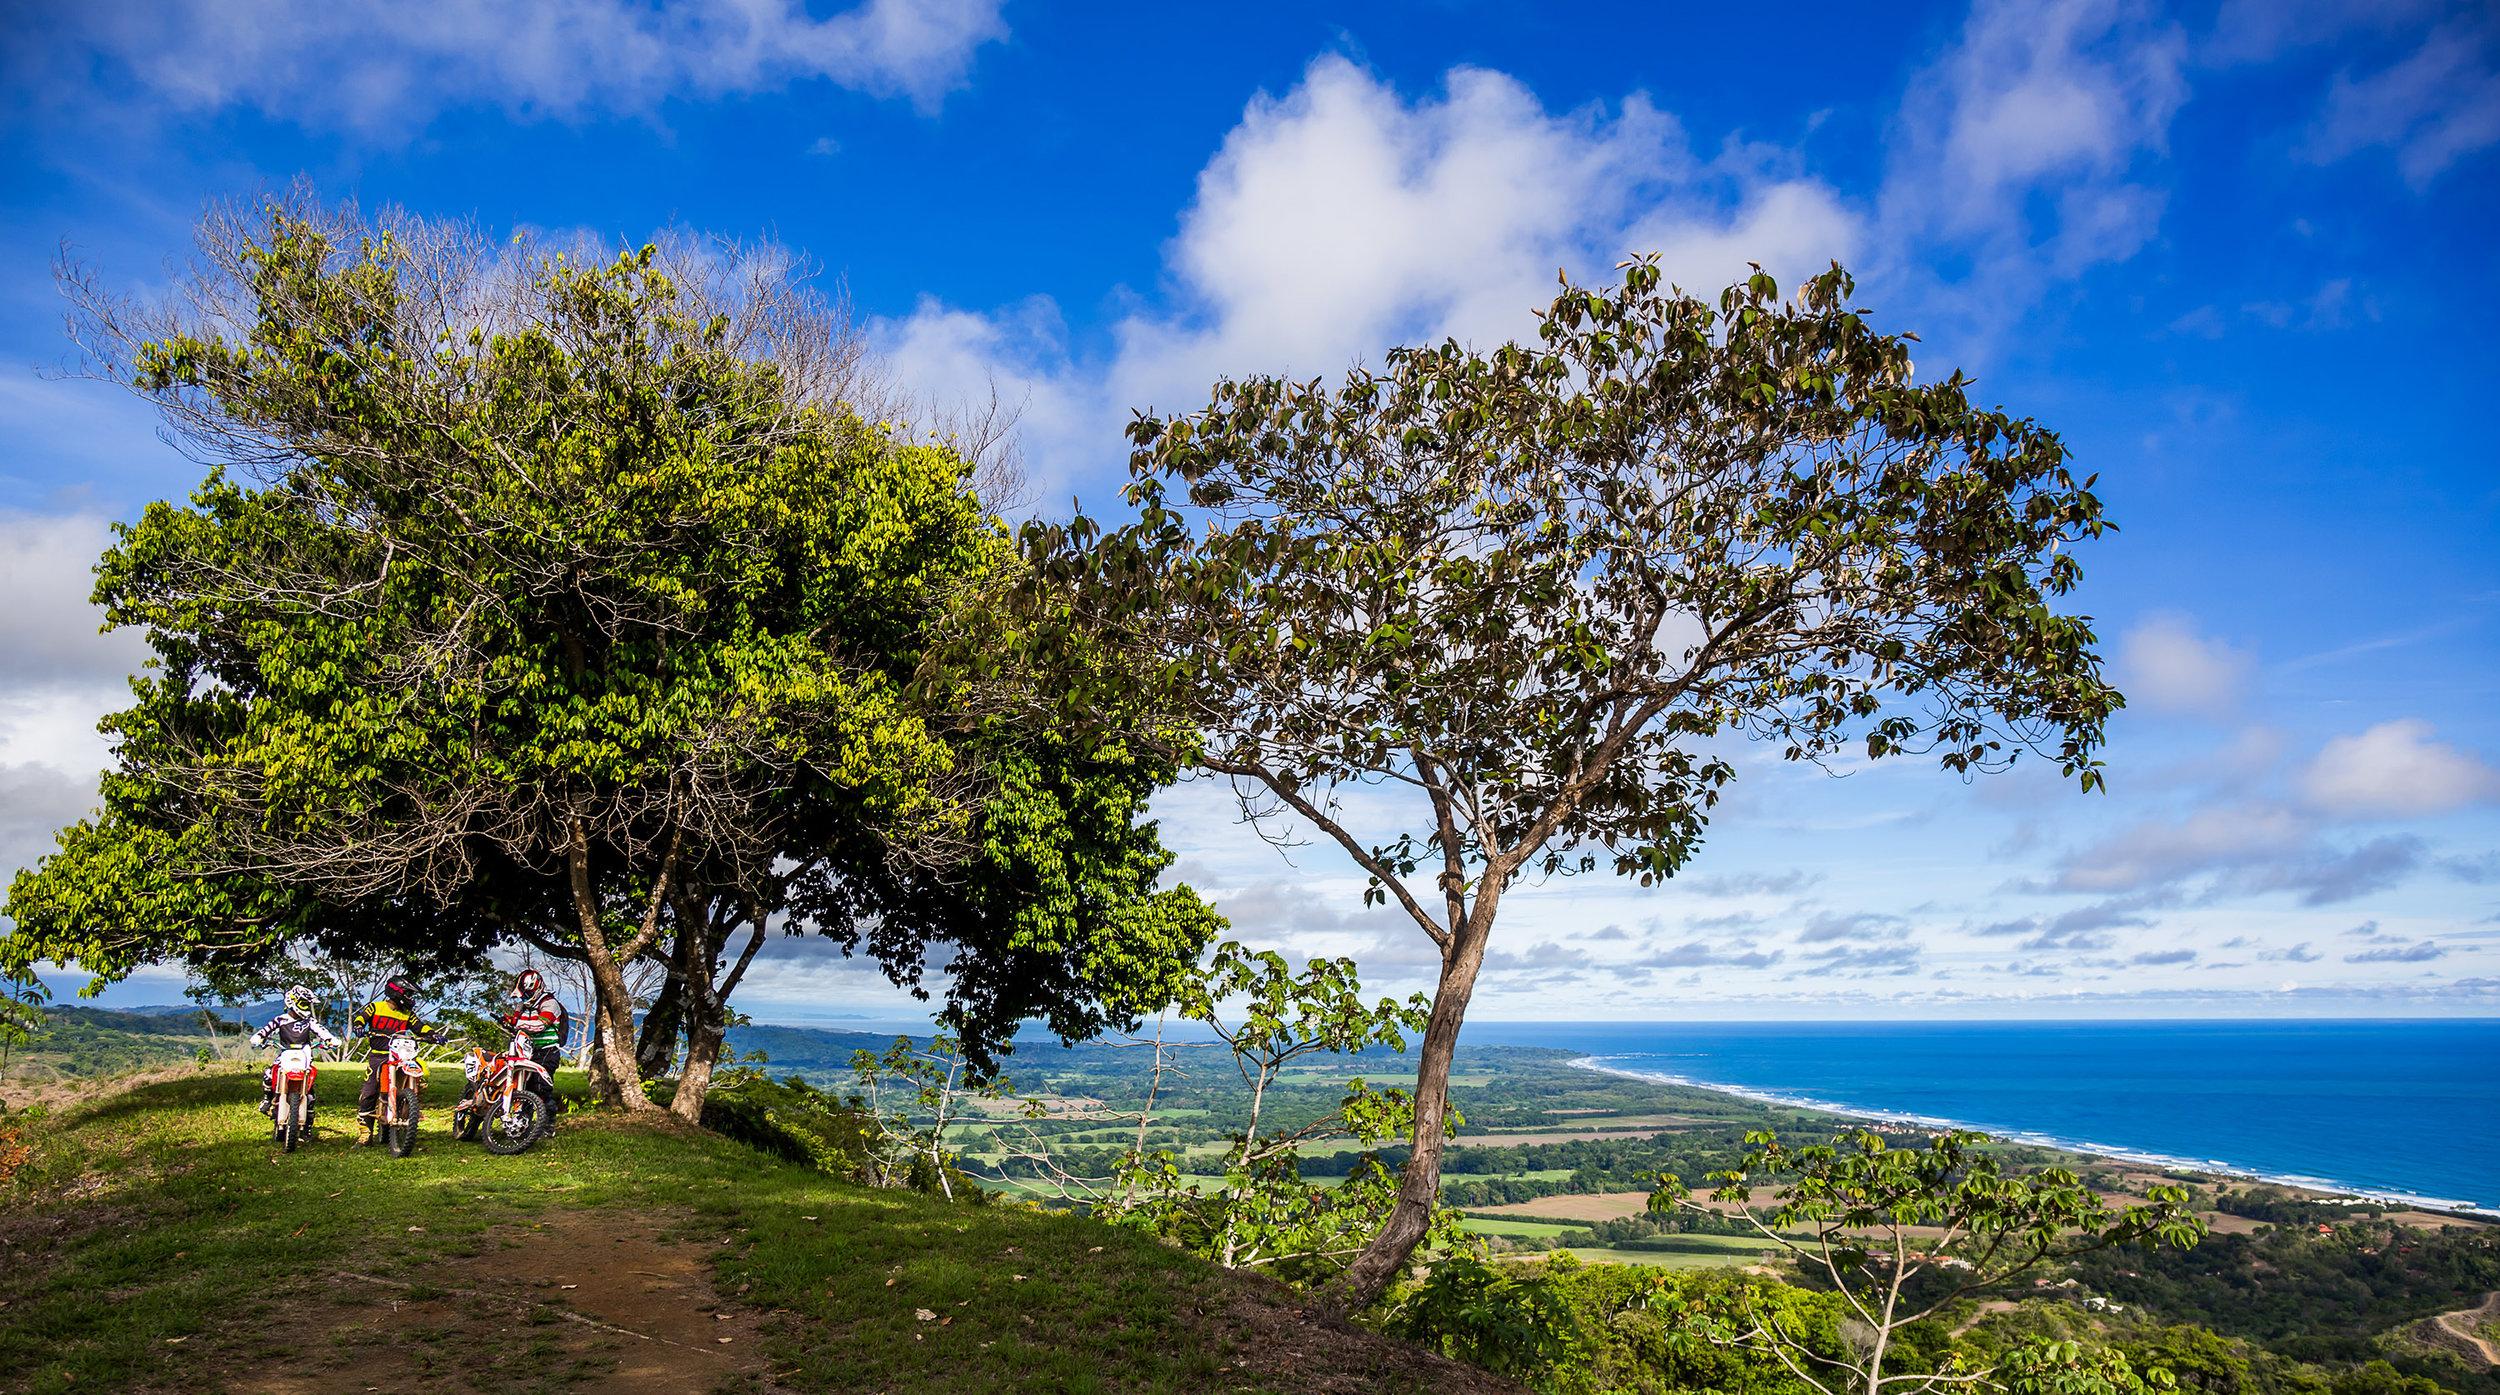 Costa_Rica-ODV_5387.jpg